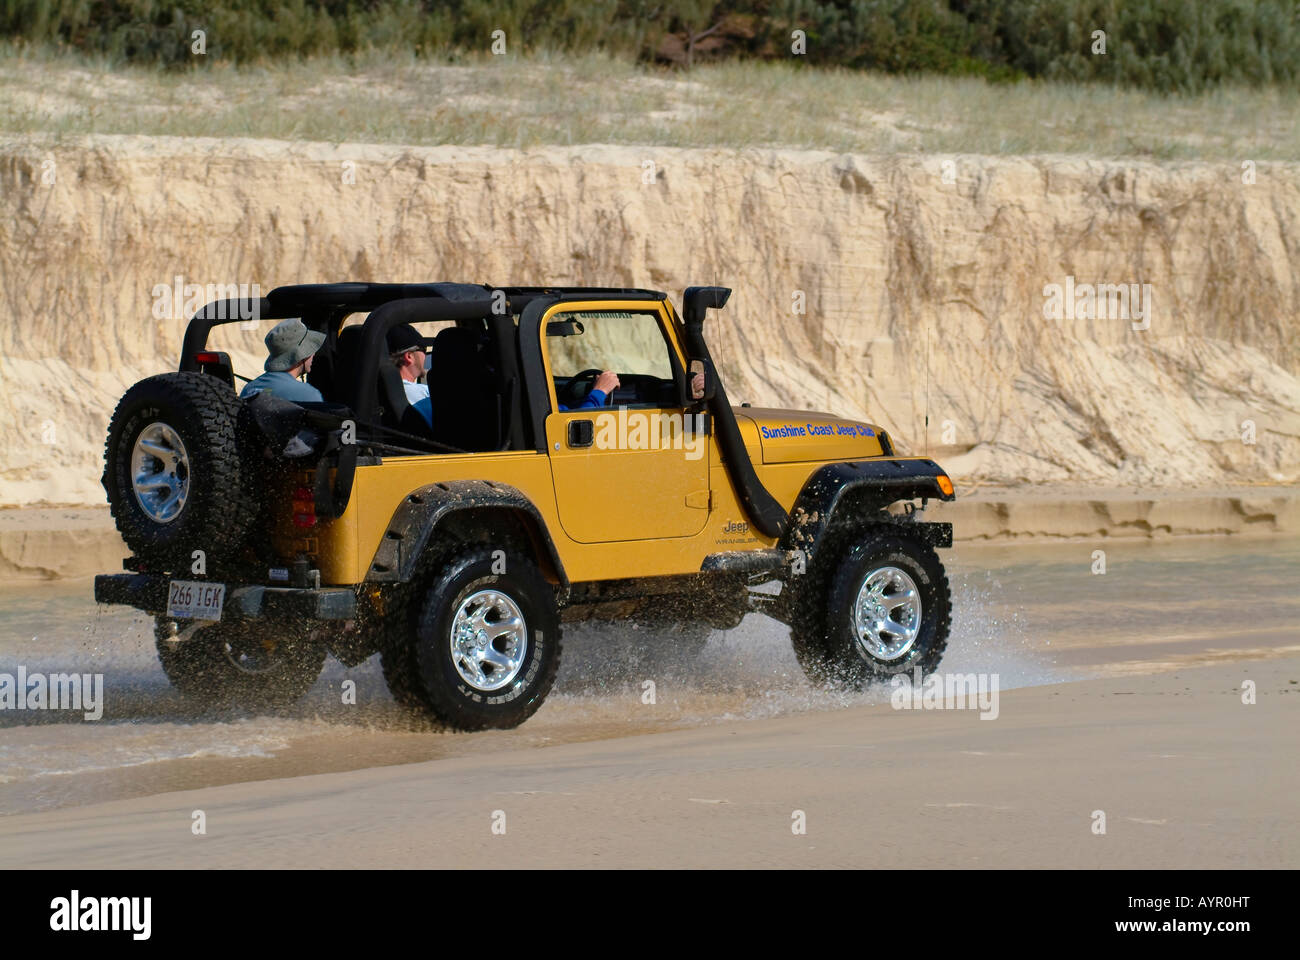 Drawing a 4x4 Jeep GLADIATOR Mopar 2020 Time Lapse | Jeep